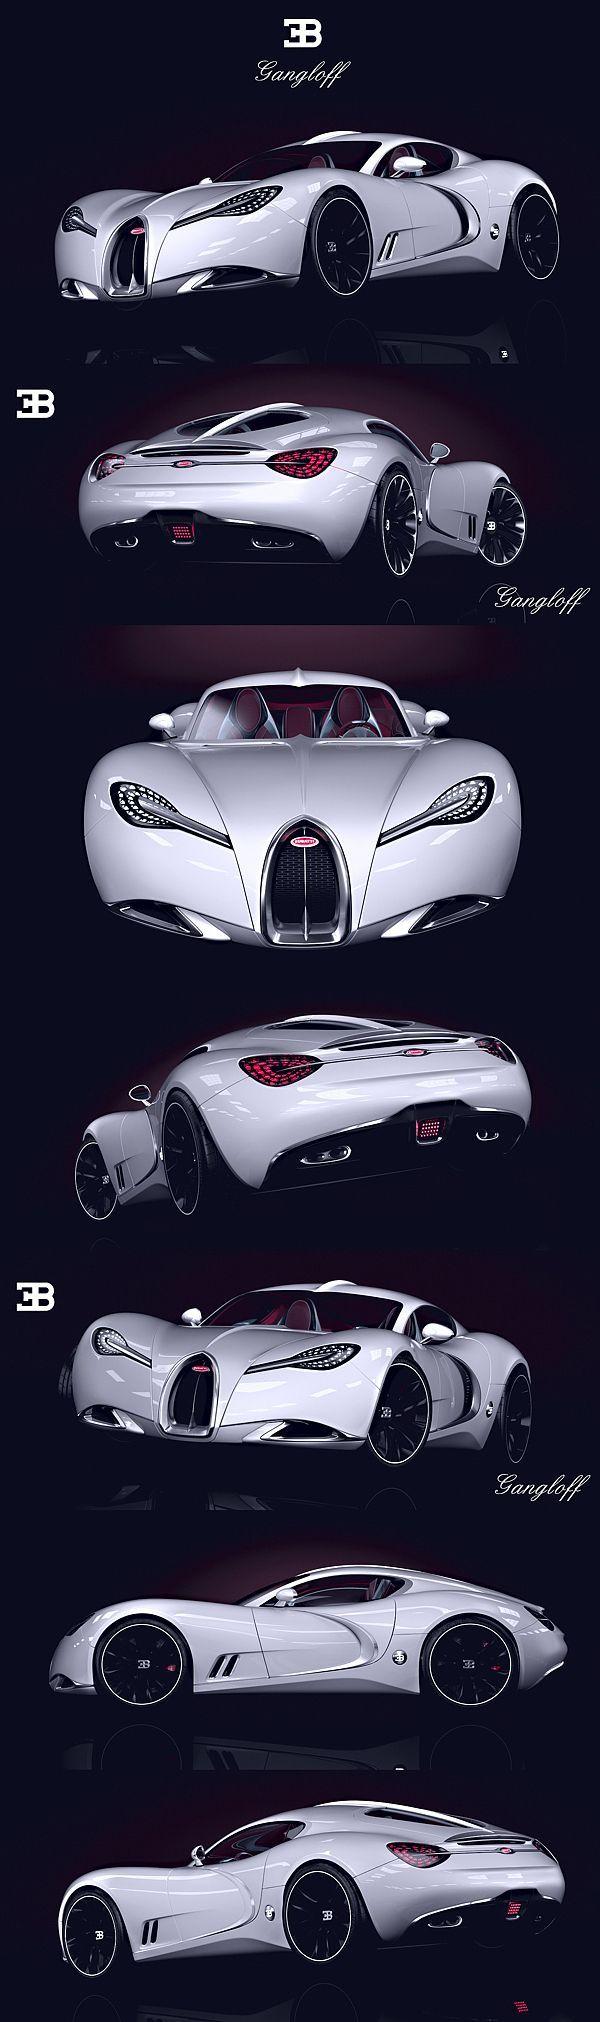 Bugatti Gangloff Concept by Paweł Czyżewski...probably the most beautiful concept ever ...: Concept, Bugatti Gangloff, Gangloff Concept, Auto, Concept Cars, Bugattigangloff